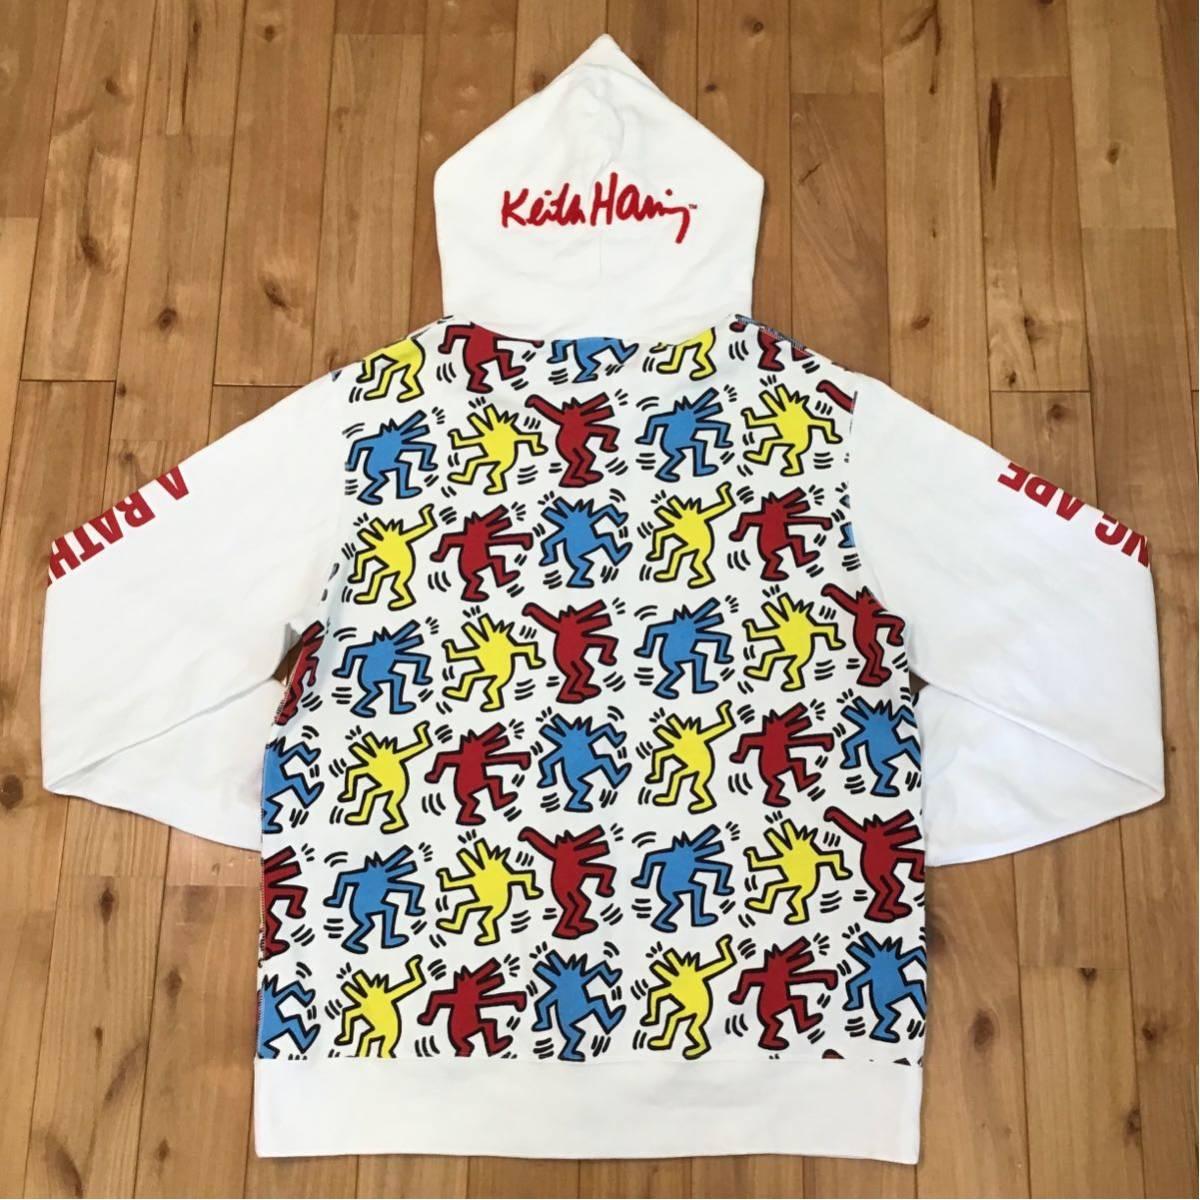 ★2XL★ キースヘリング × BAPE シャーク パーカー KEITH HARING shark full zip hoodie a bathing ape エイプ ベイプ XXL tp65